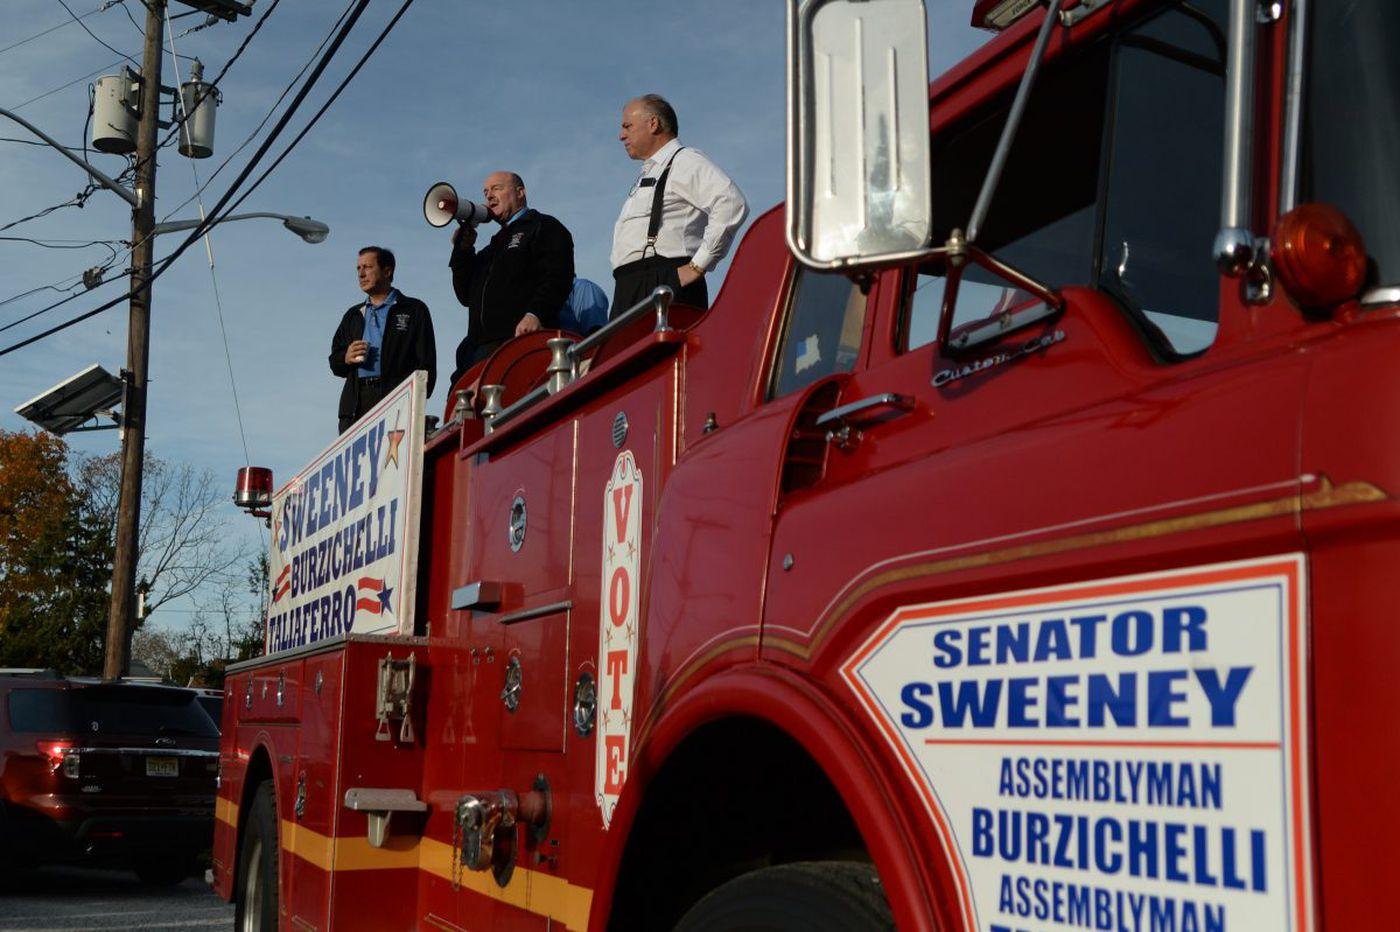 South Jersey Dem machine, teachers' union barrel toward Election Day